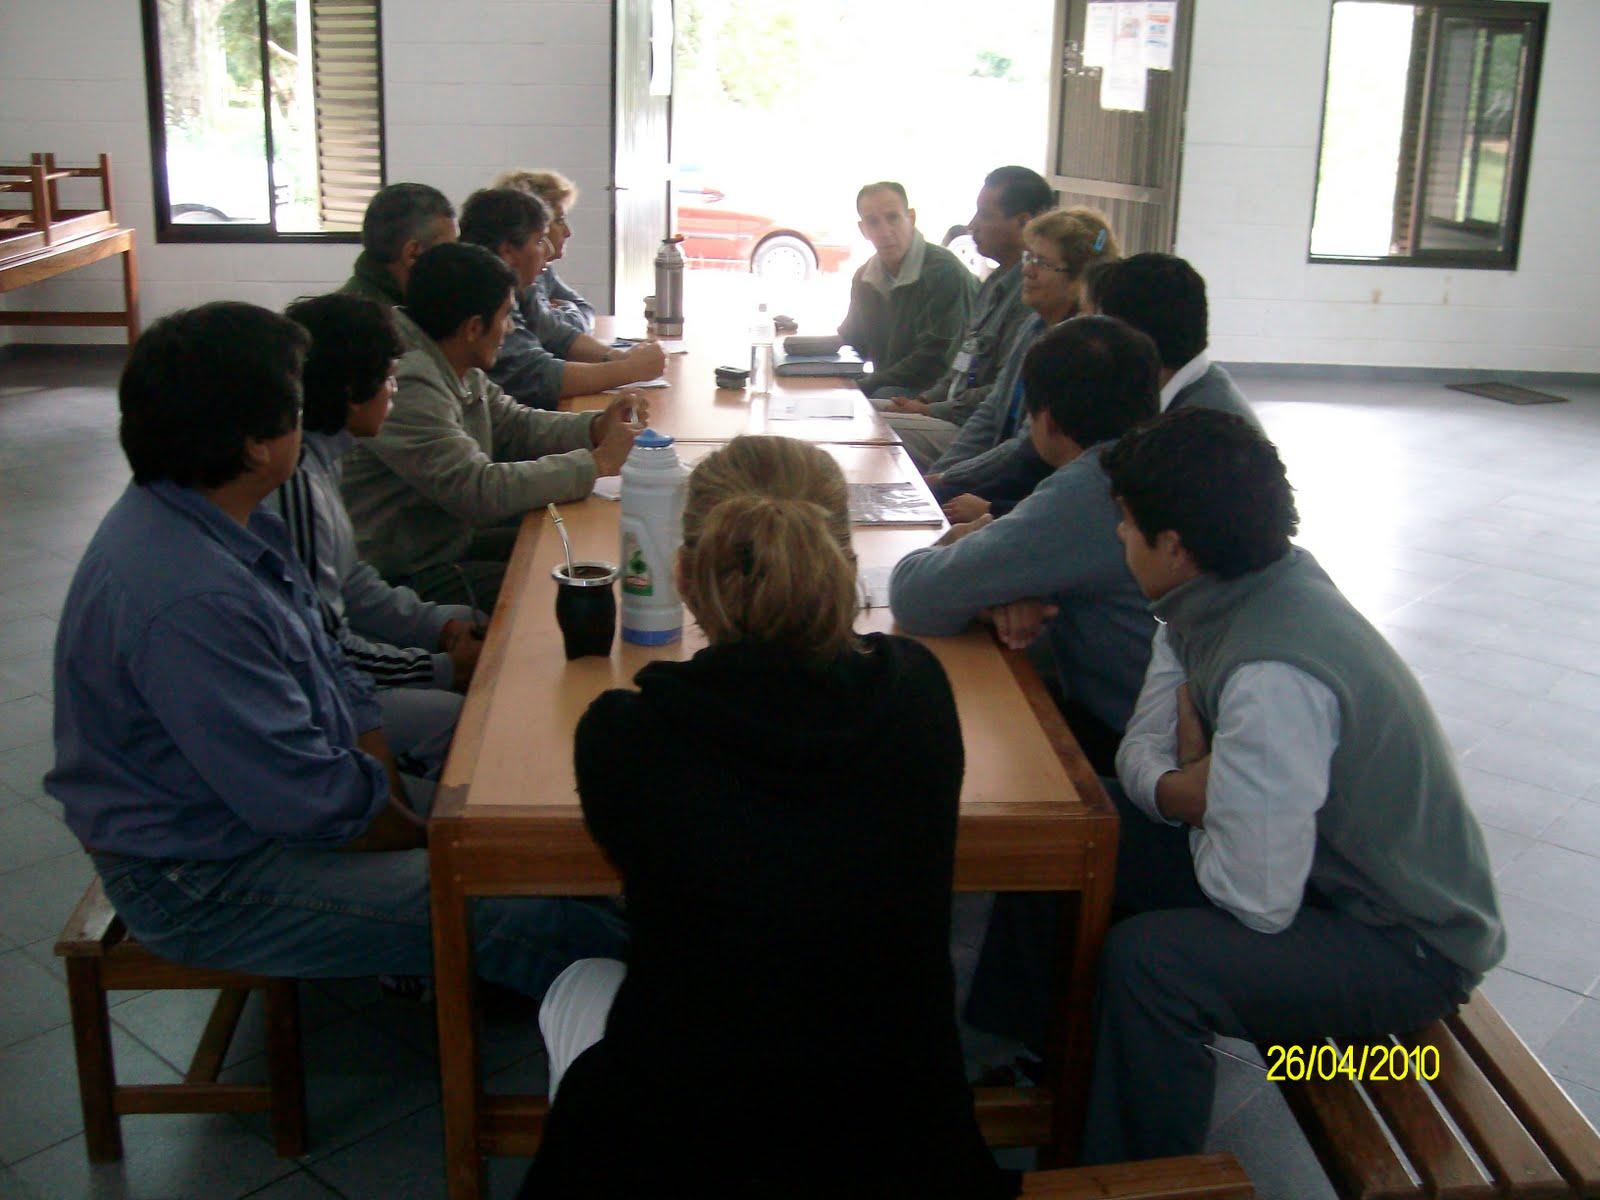 Anna Santos Abril 2010: Www.taekwondo-filial-santaana.blogspot.com: Abril 2010